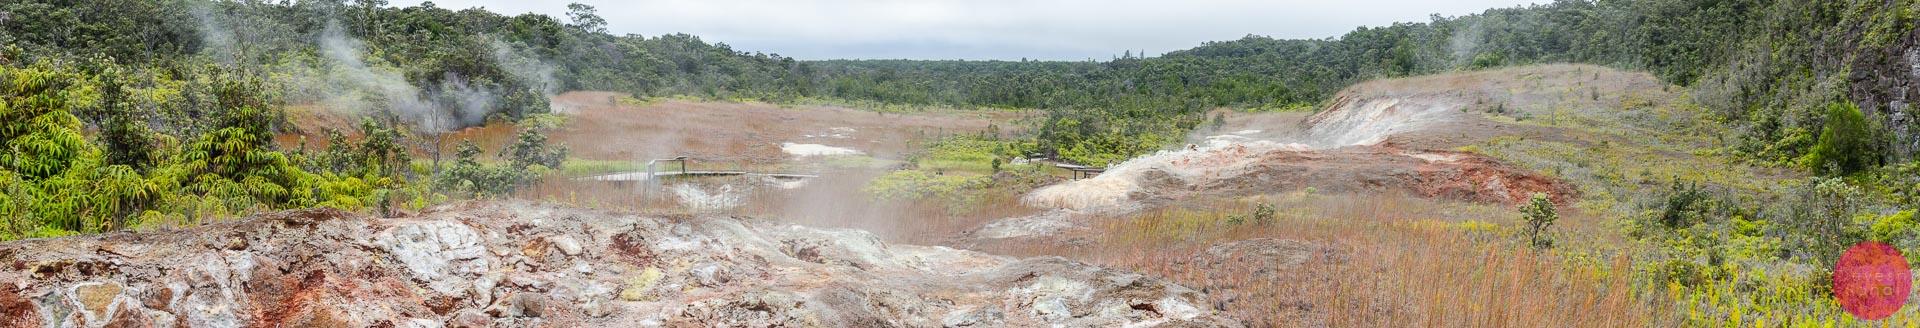 Panoramic view of the Haakulamanu (Sulphur Banks) Trail at the Volcanoes National Park